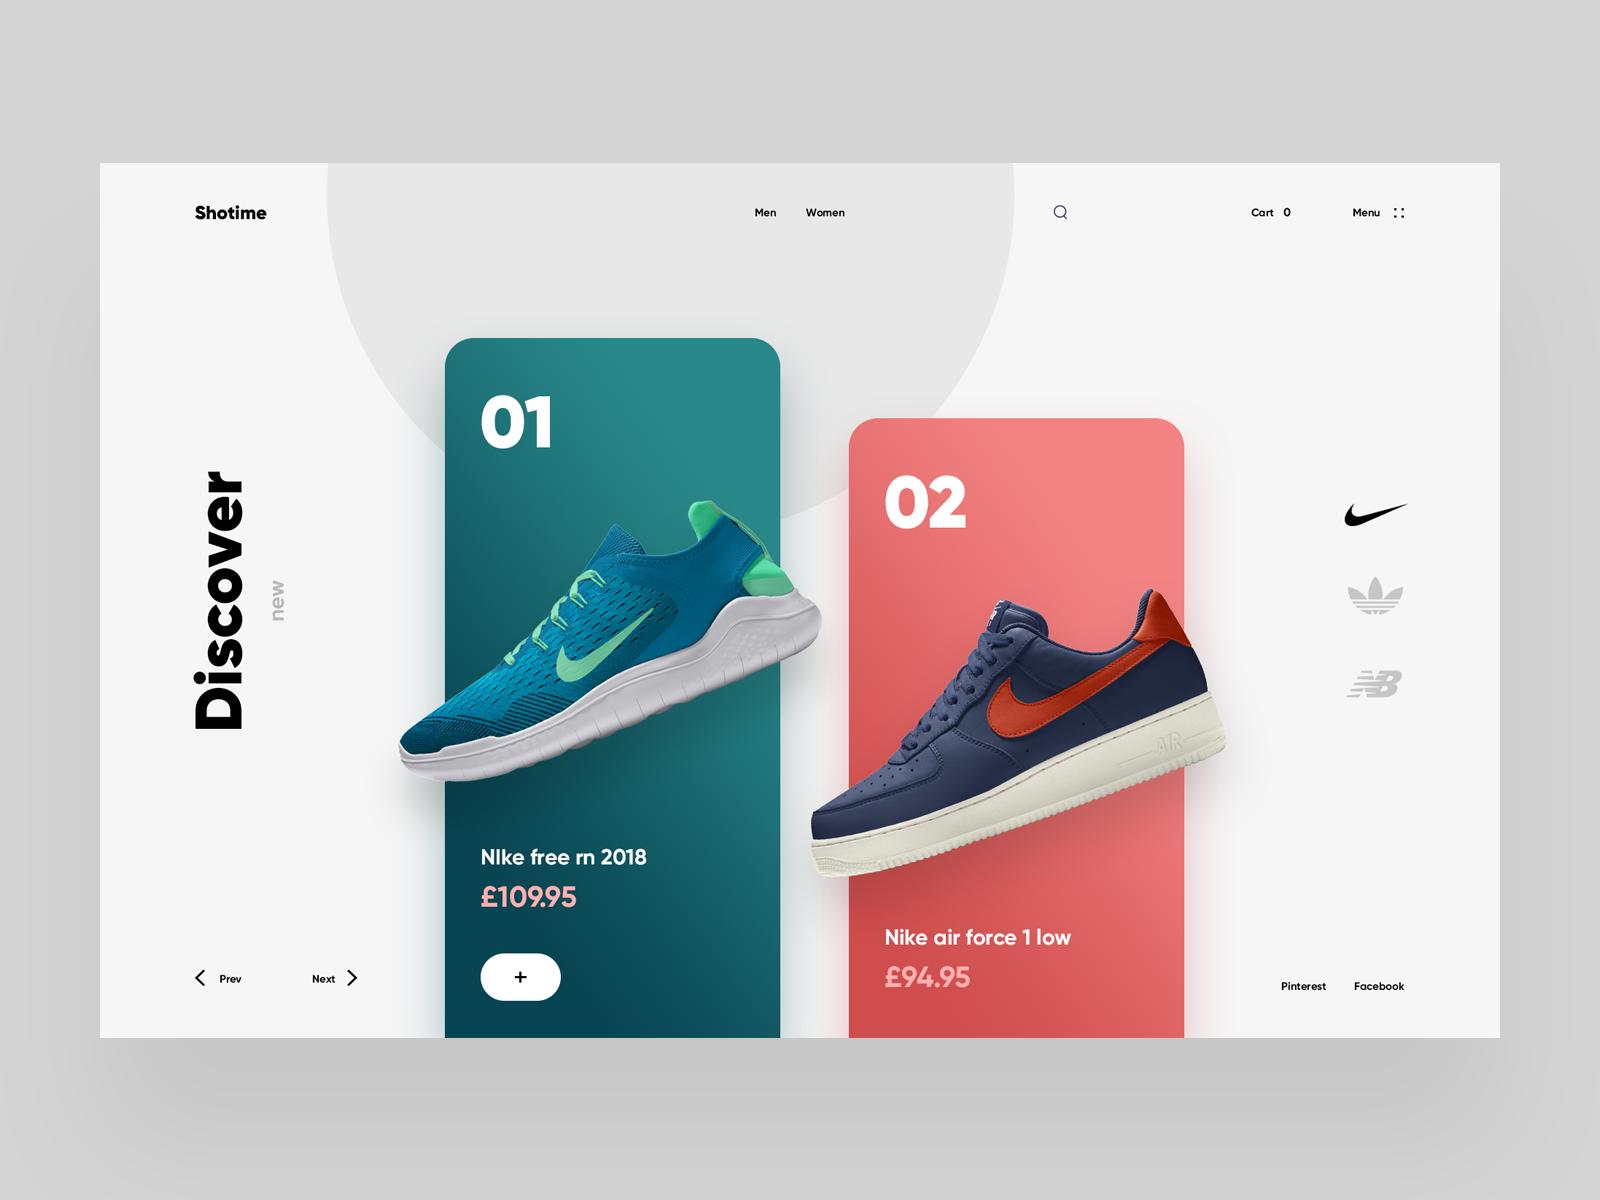 los angeles d32d7 29a0f Shotime e-commerce inspiration giga tamarashvili shop buy cart landing  store ecommerce colors sneaker shoe nike